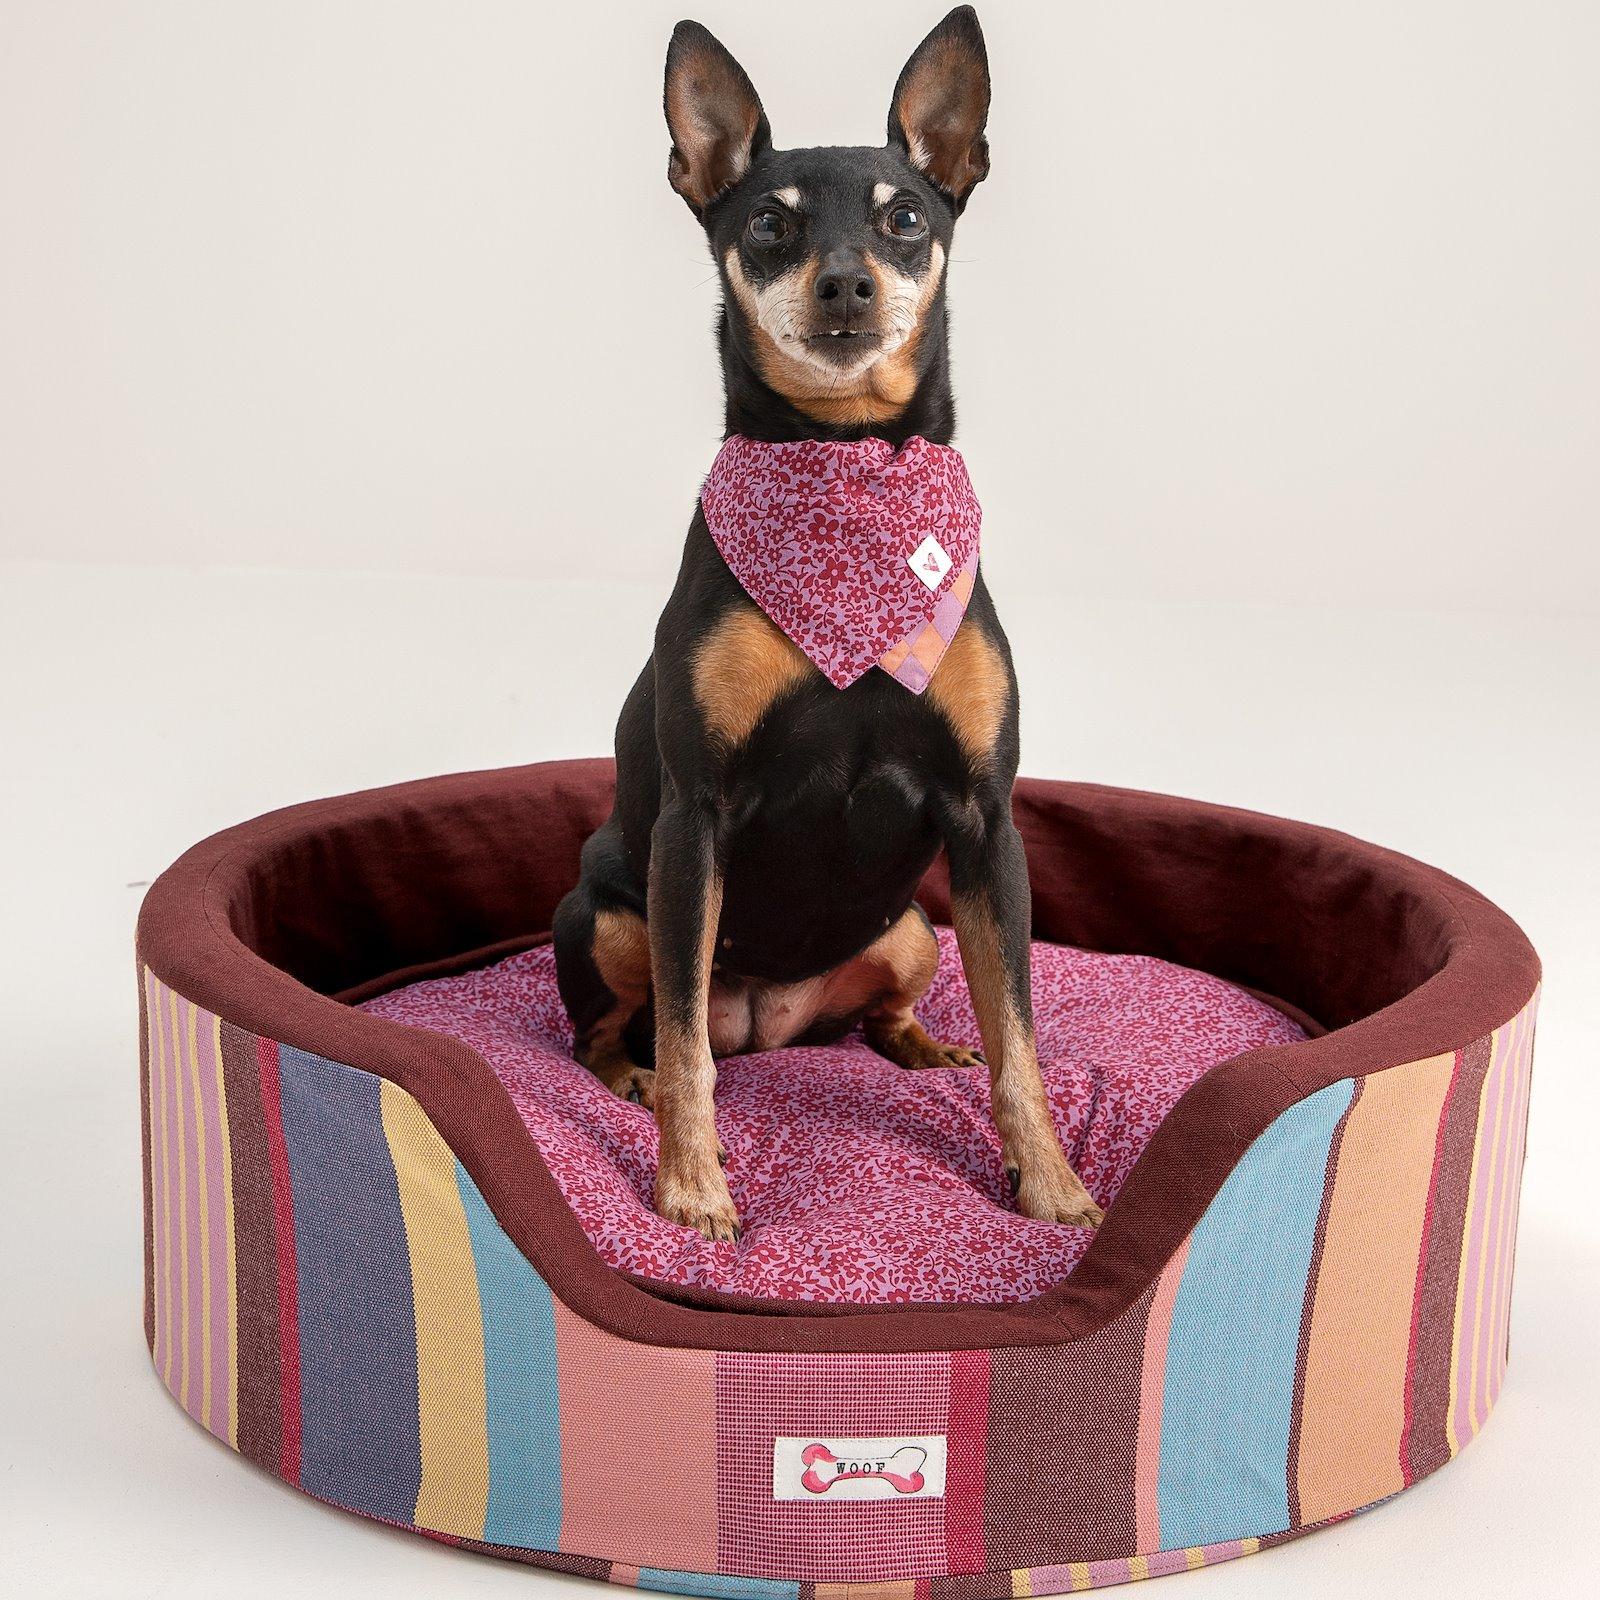 Dog basket DIY9017_852413_852410_24848_p90348_780550_410144_852413_24848_bundle